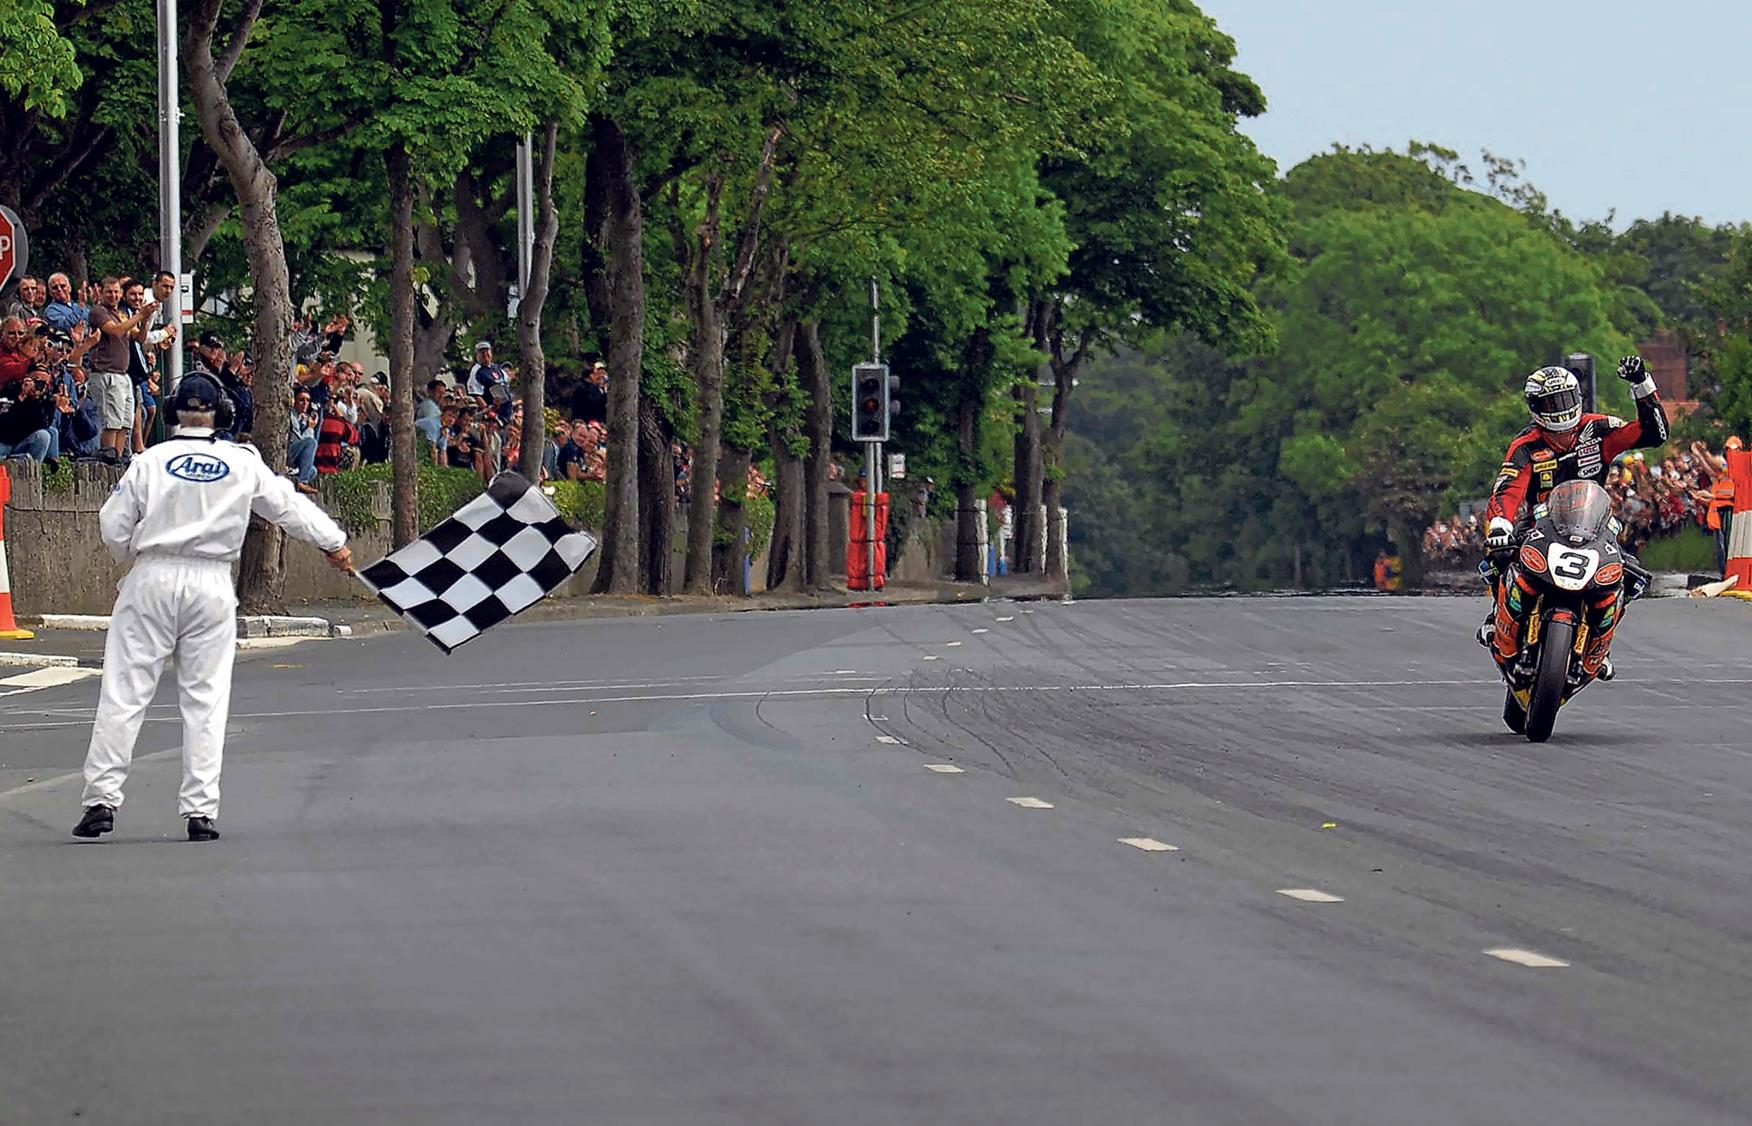 John McGuinness does the first 130mph TT lap